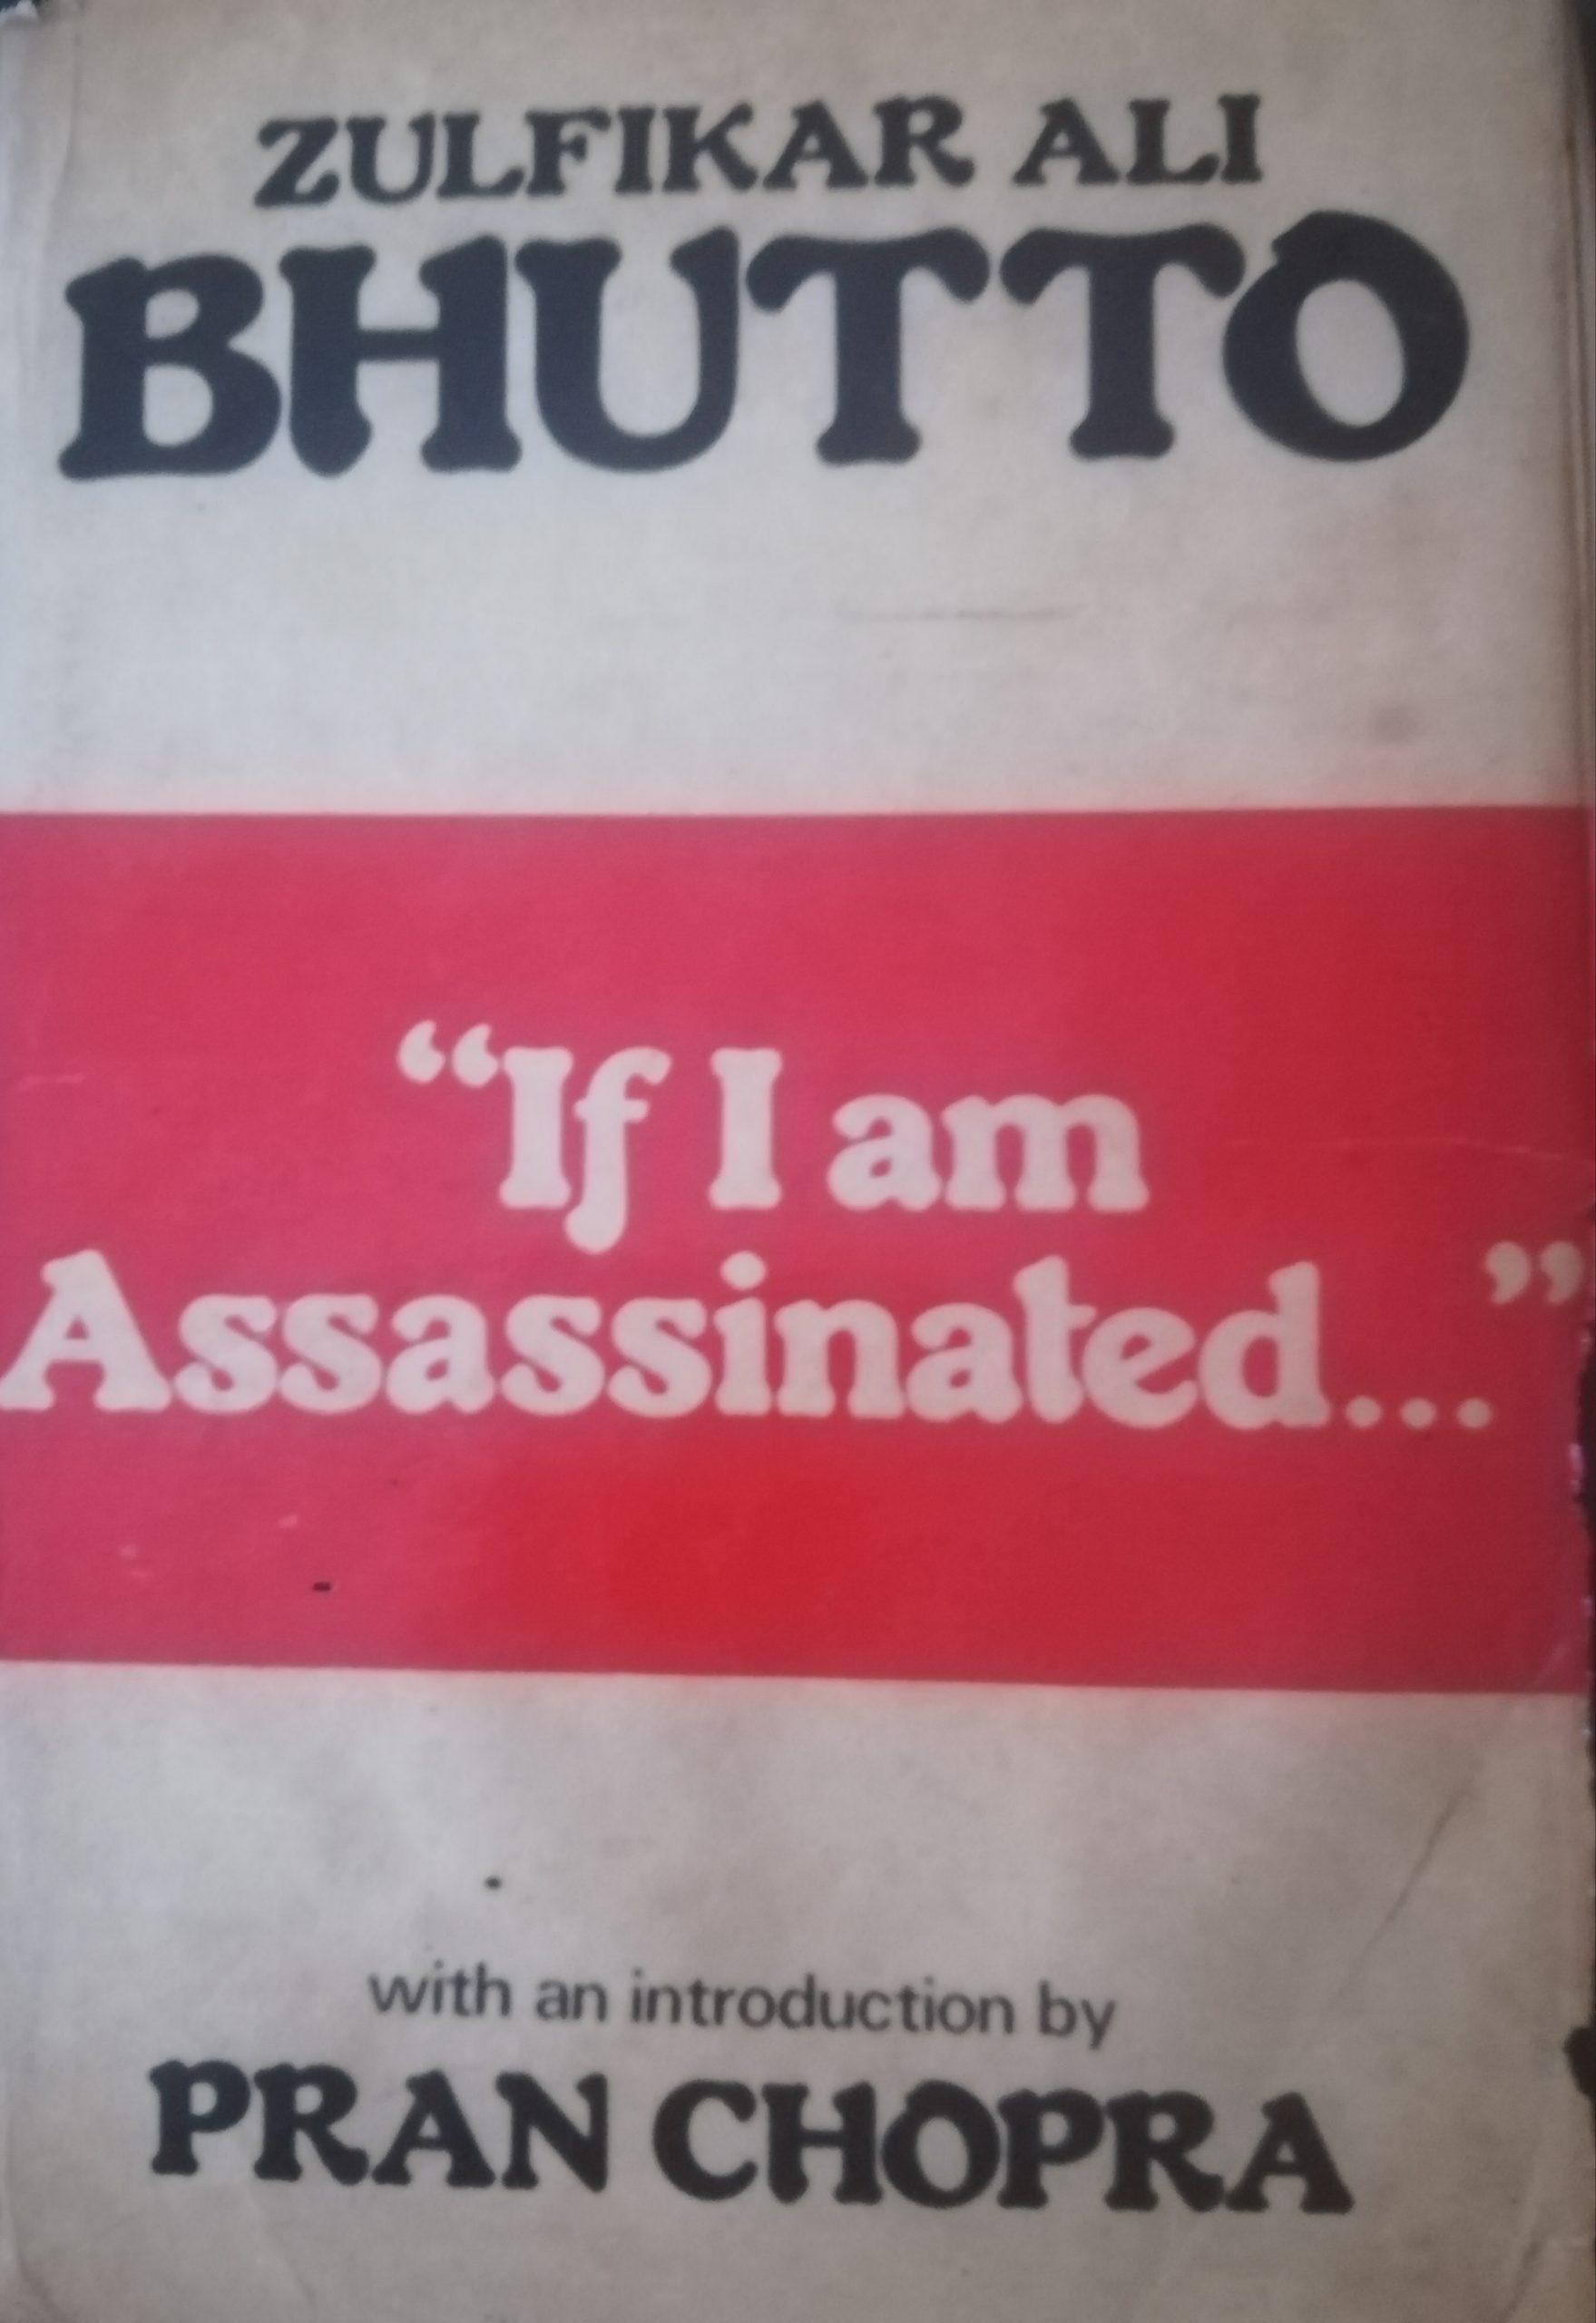 If I am Assassinated